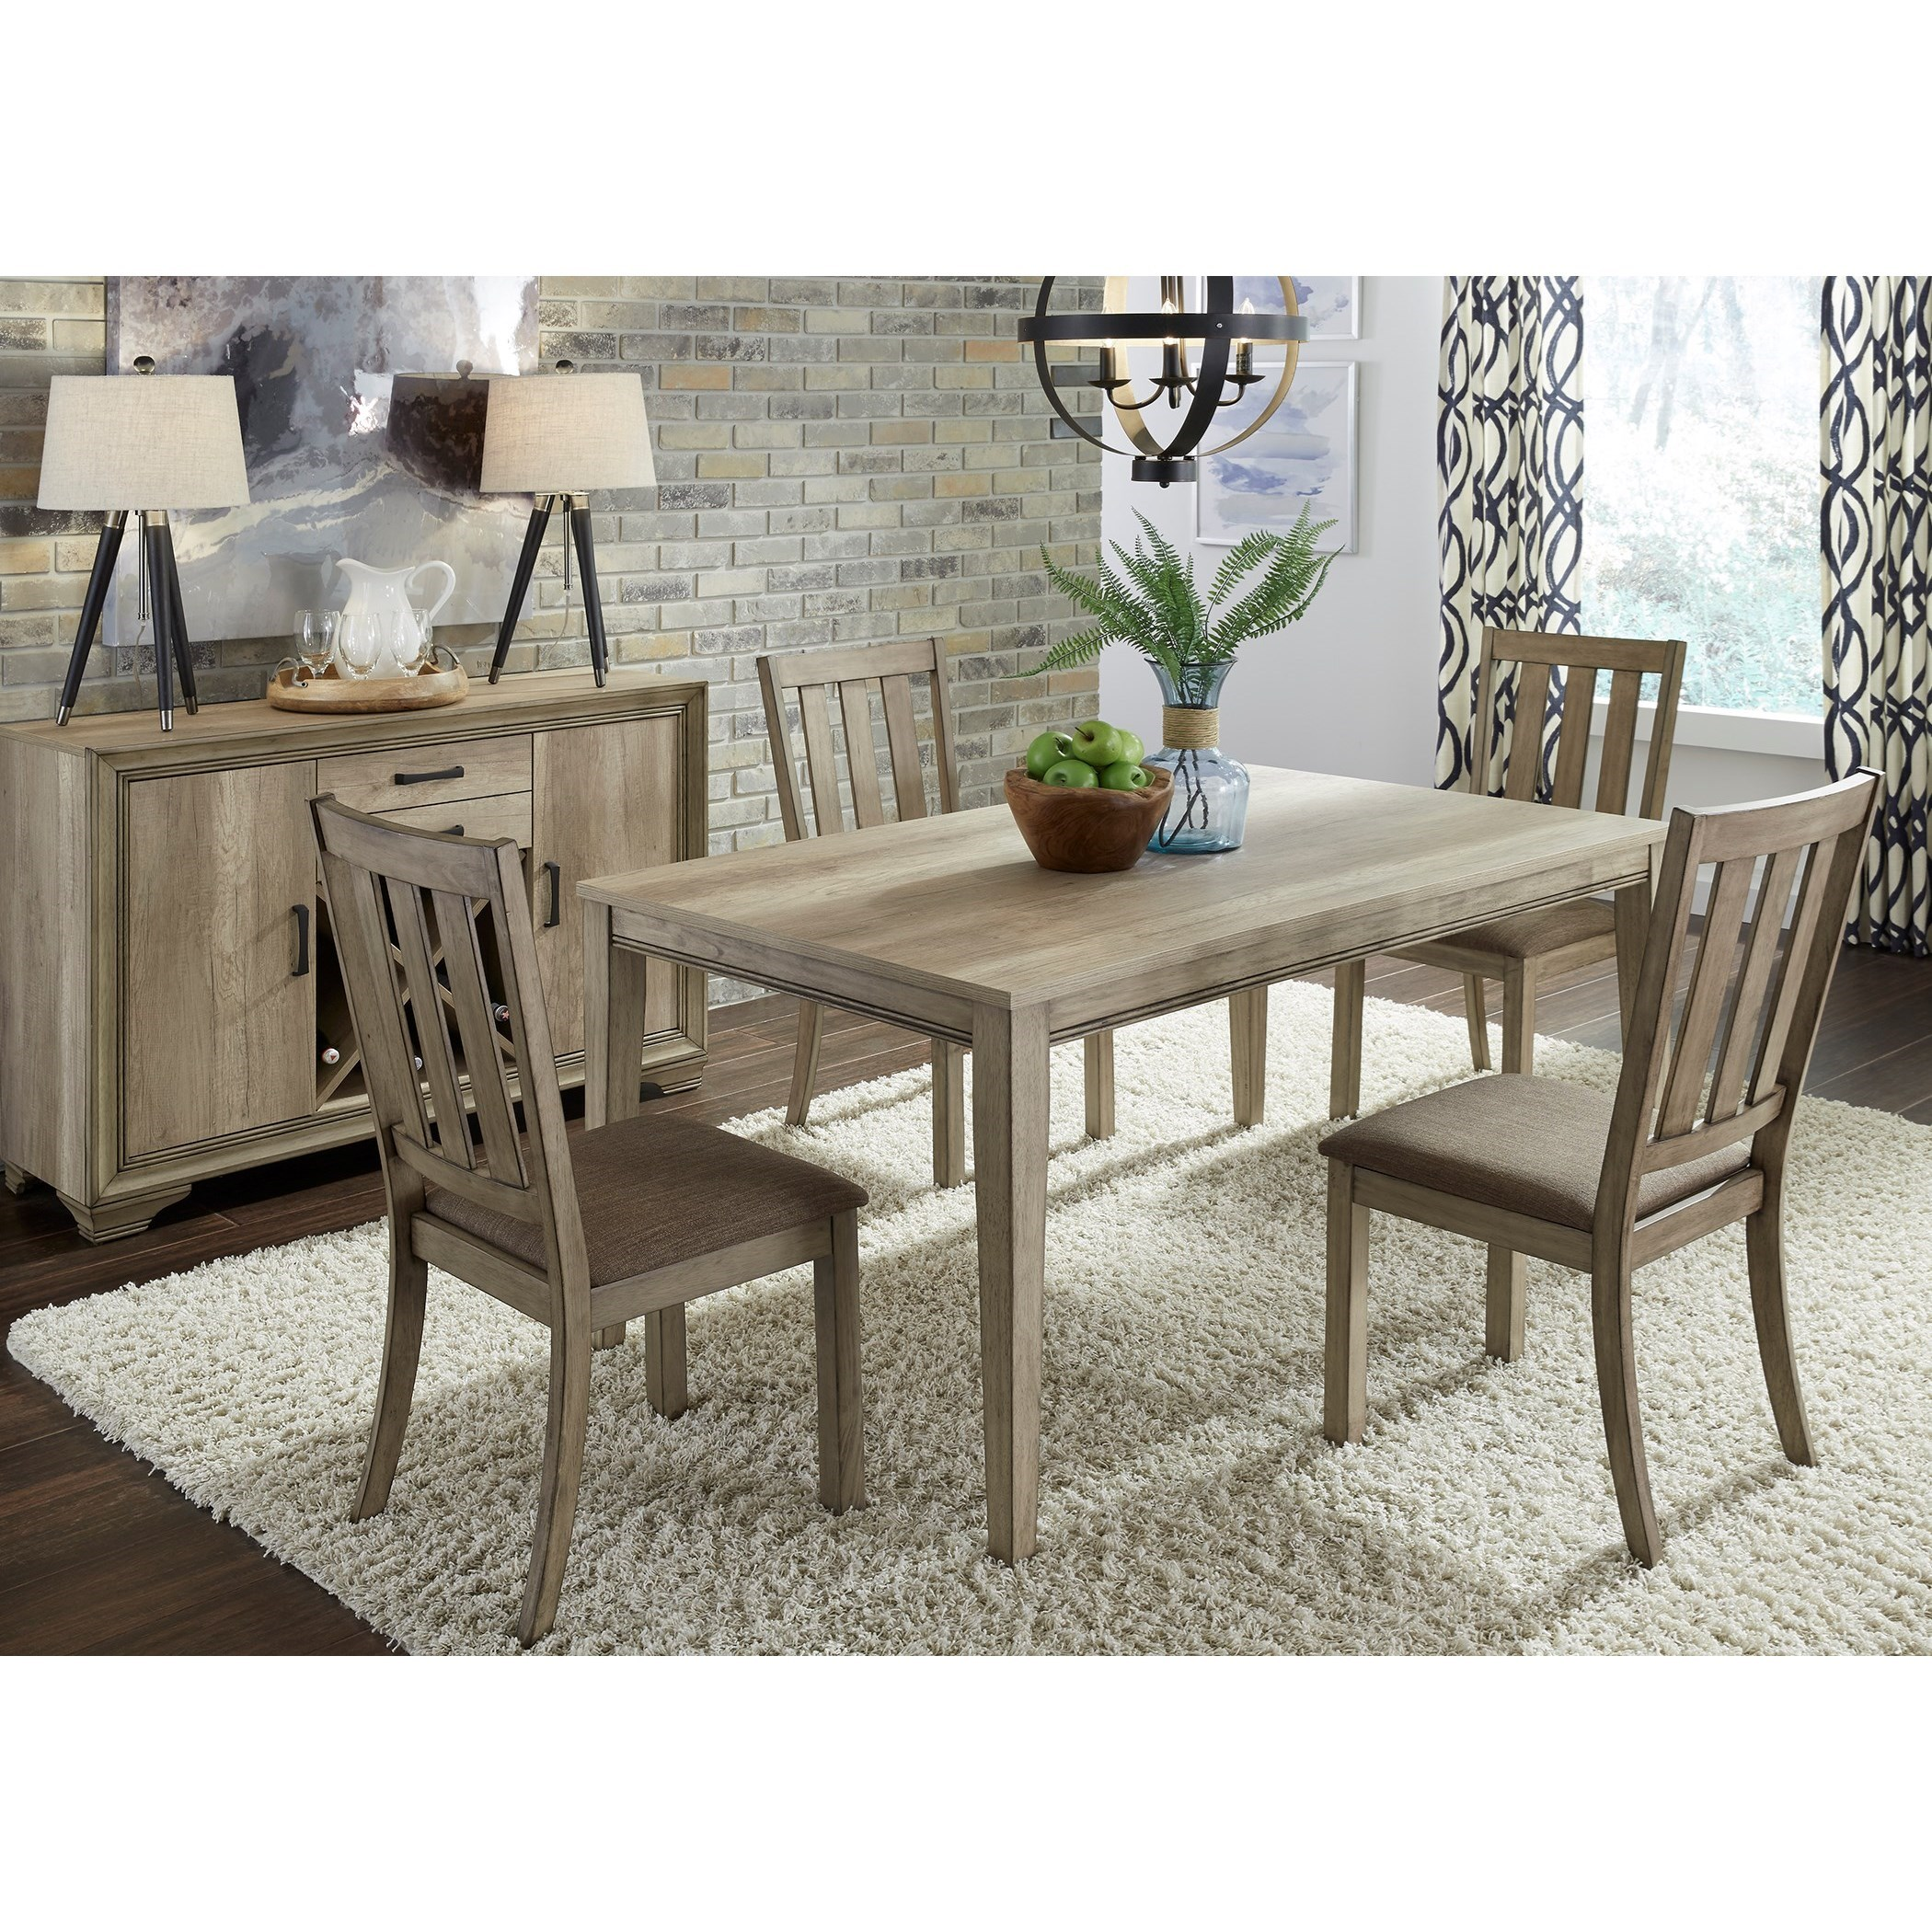 Sun Valley 5 Piece Rectangular Table Set  by Liberty Furniture at Lapeer Furniture & Mattress Center